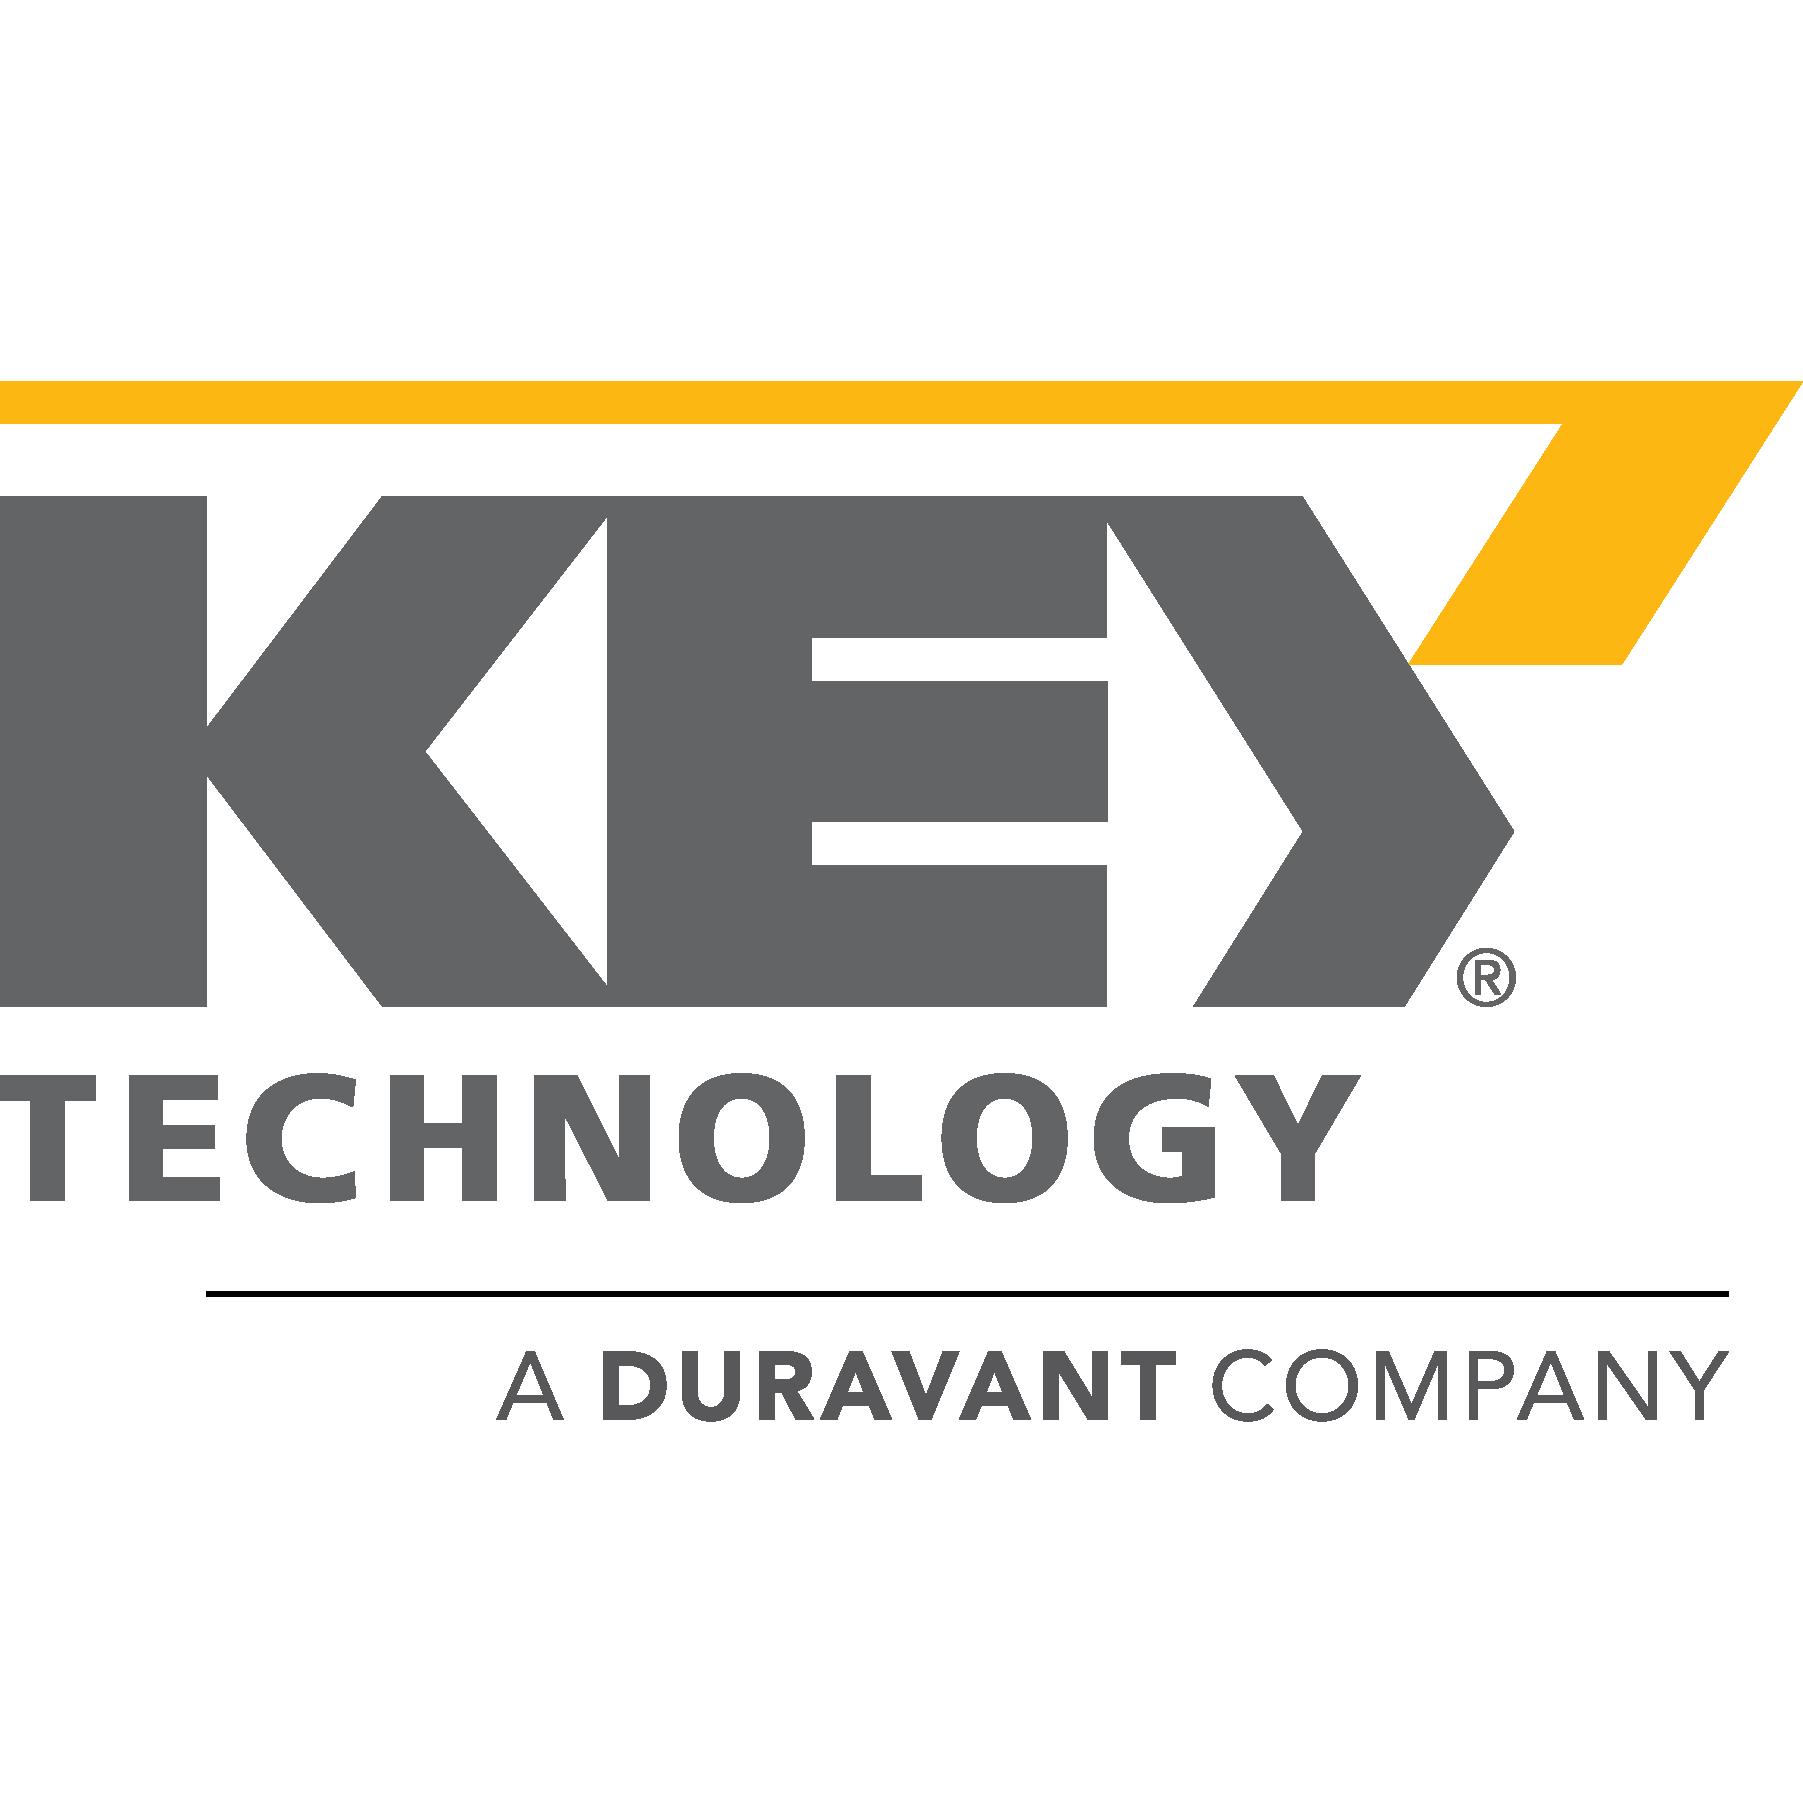 KeyTech_4C Lockup_Square.png